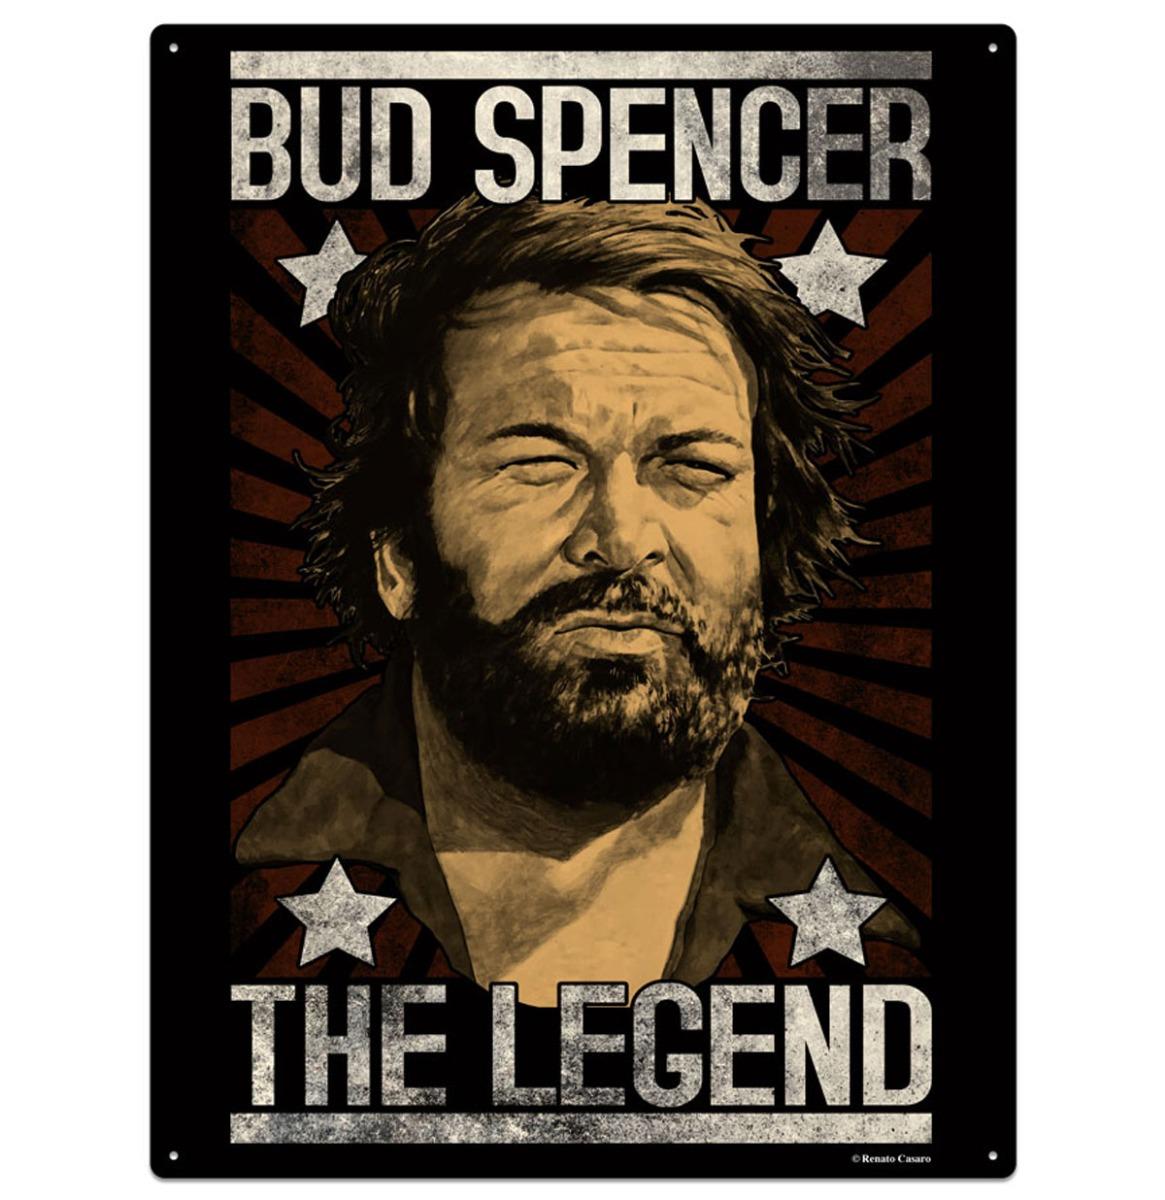 Bud Spencer The Legend Metalen Bord 30 x 40 cm